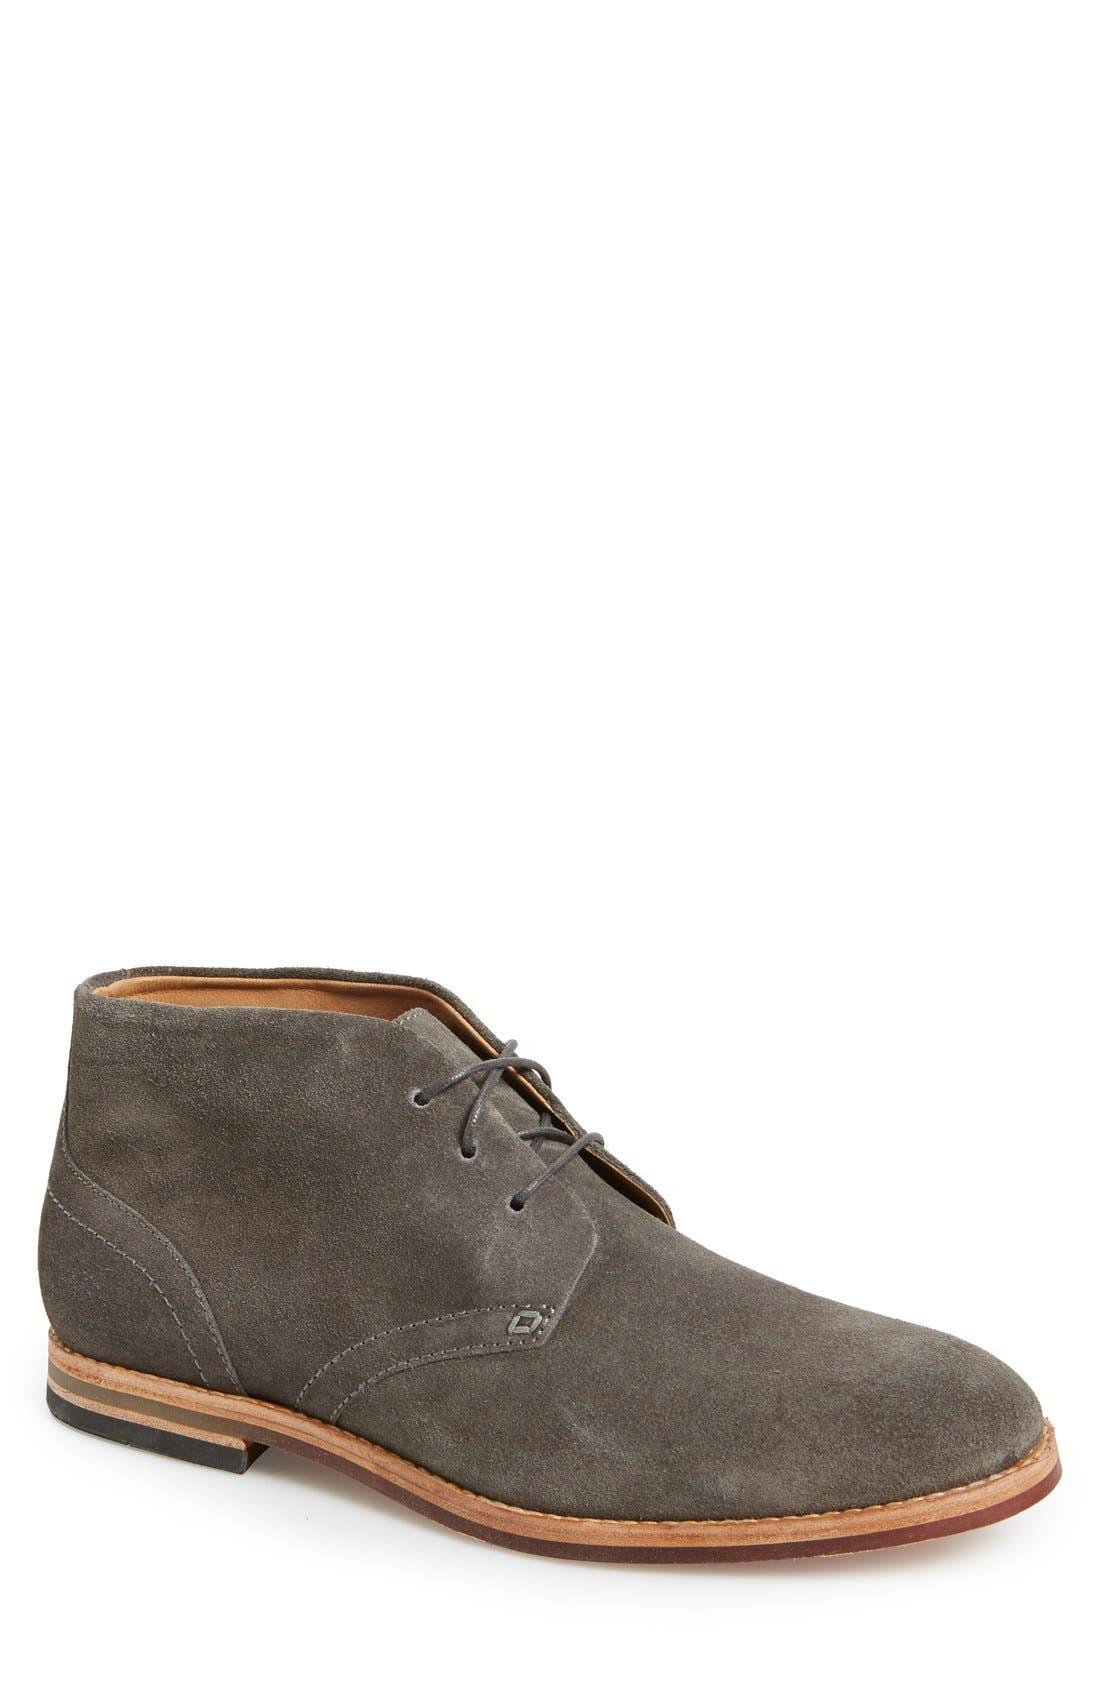 'Houghton 3' Suede Chukka Boot, Main, color, 055